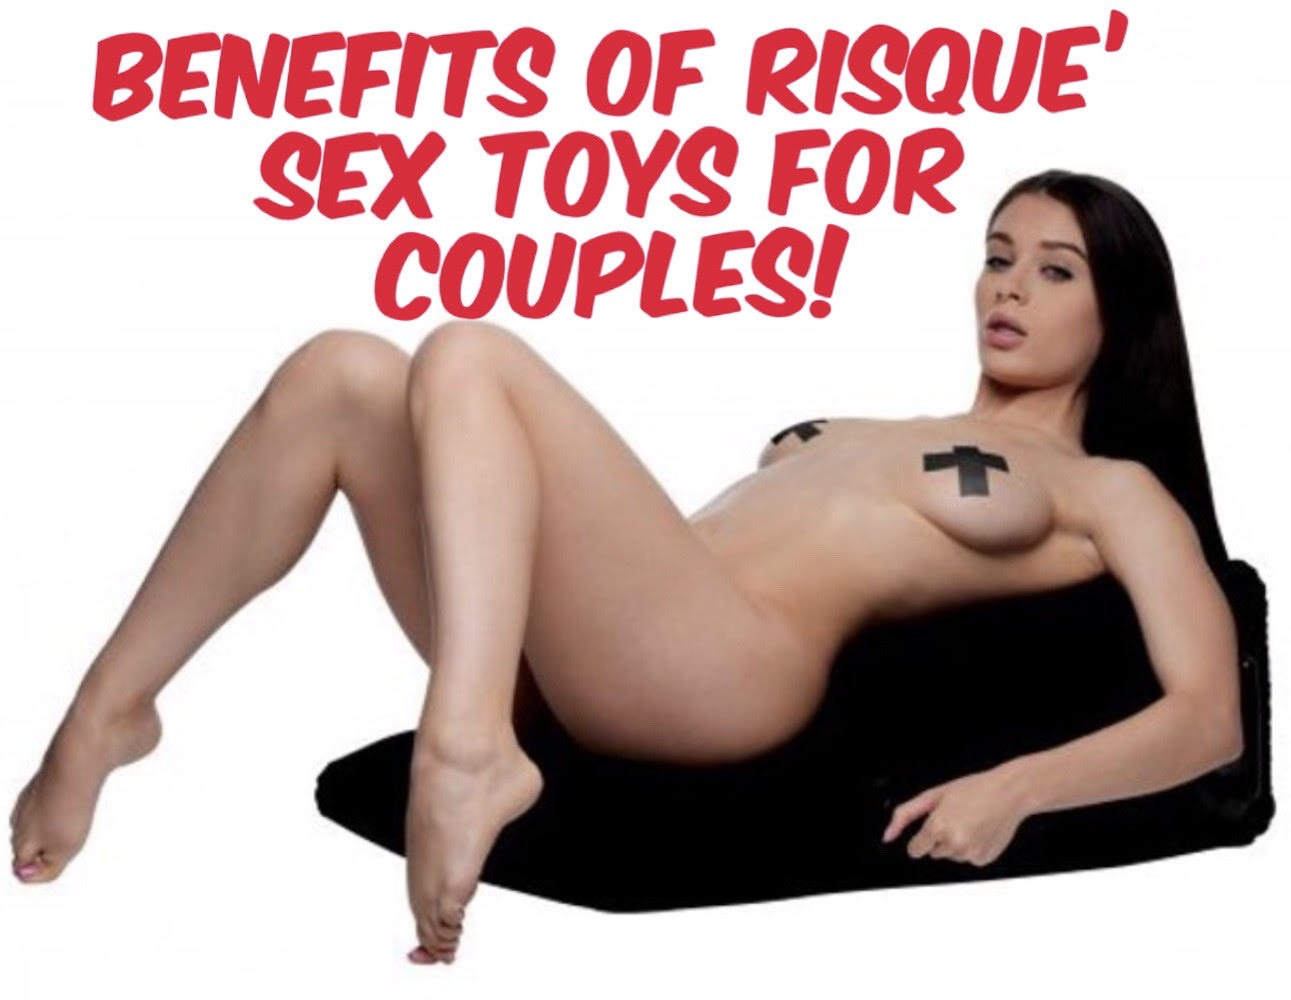 Benefits of Risqué Sex Toys_couples